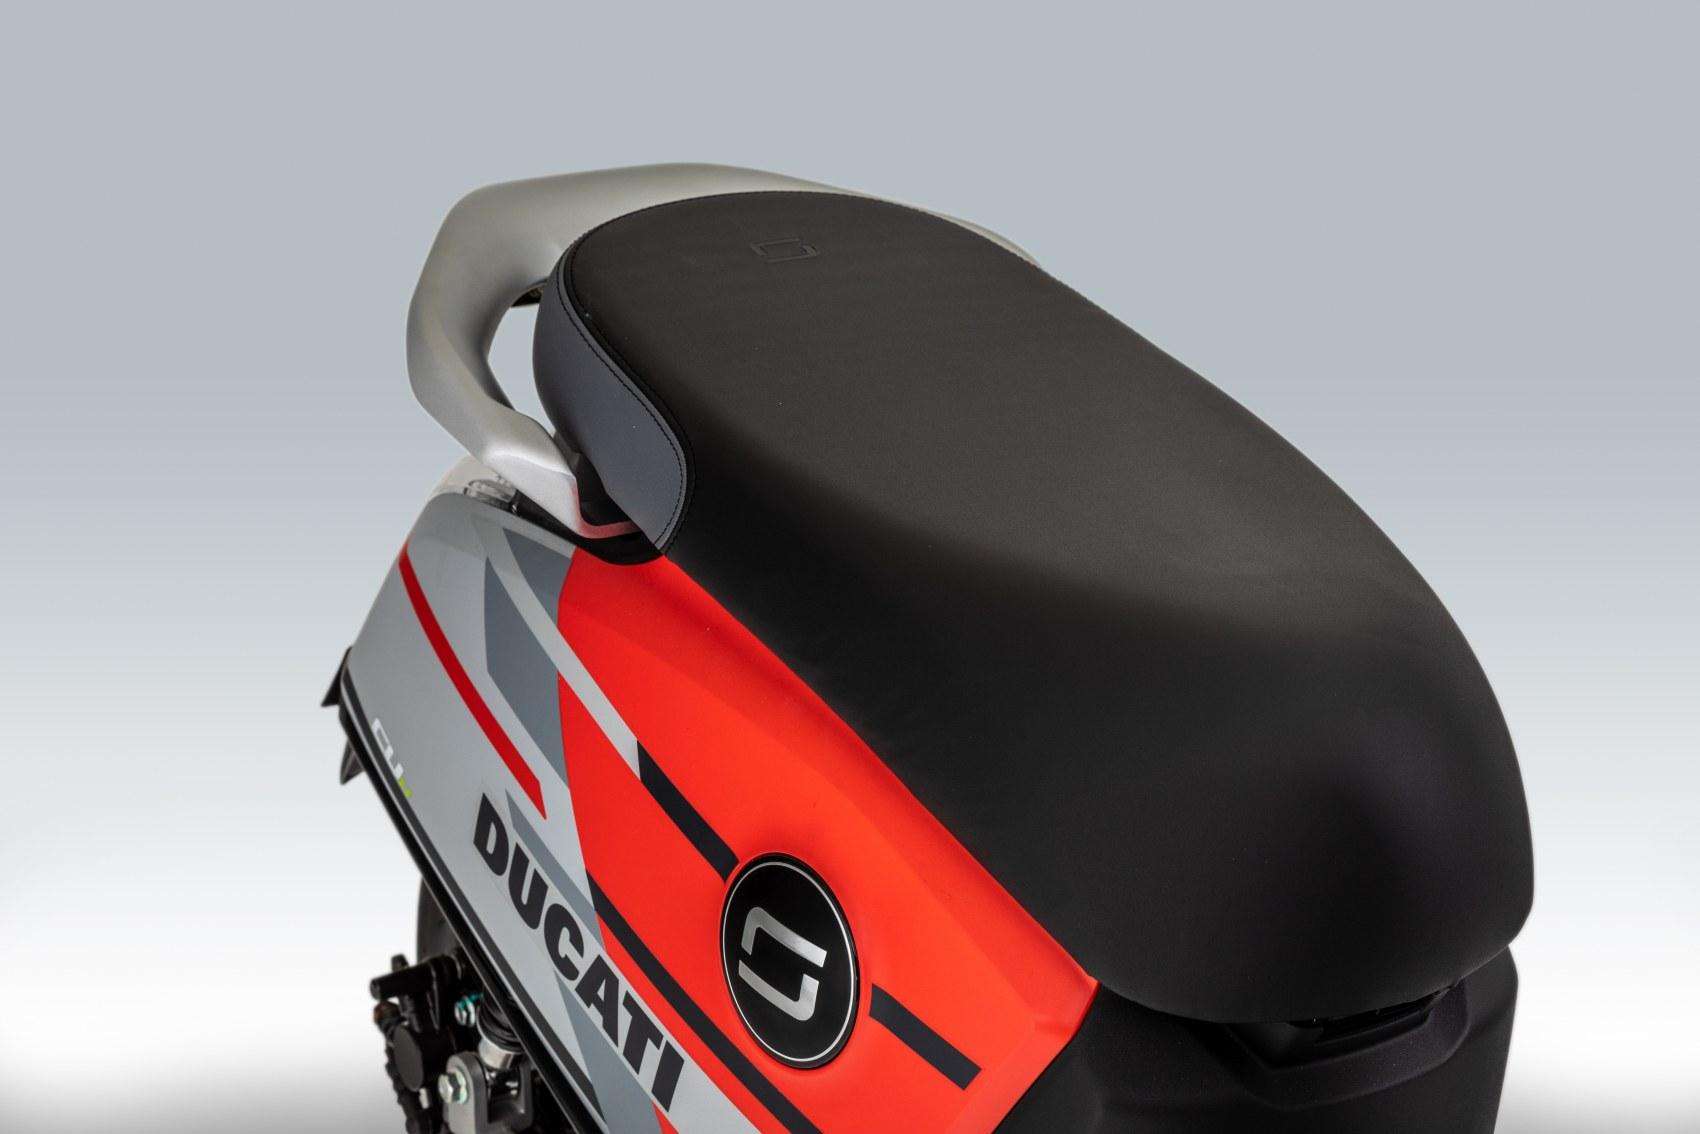 Super Soco CUx electric scooter seat